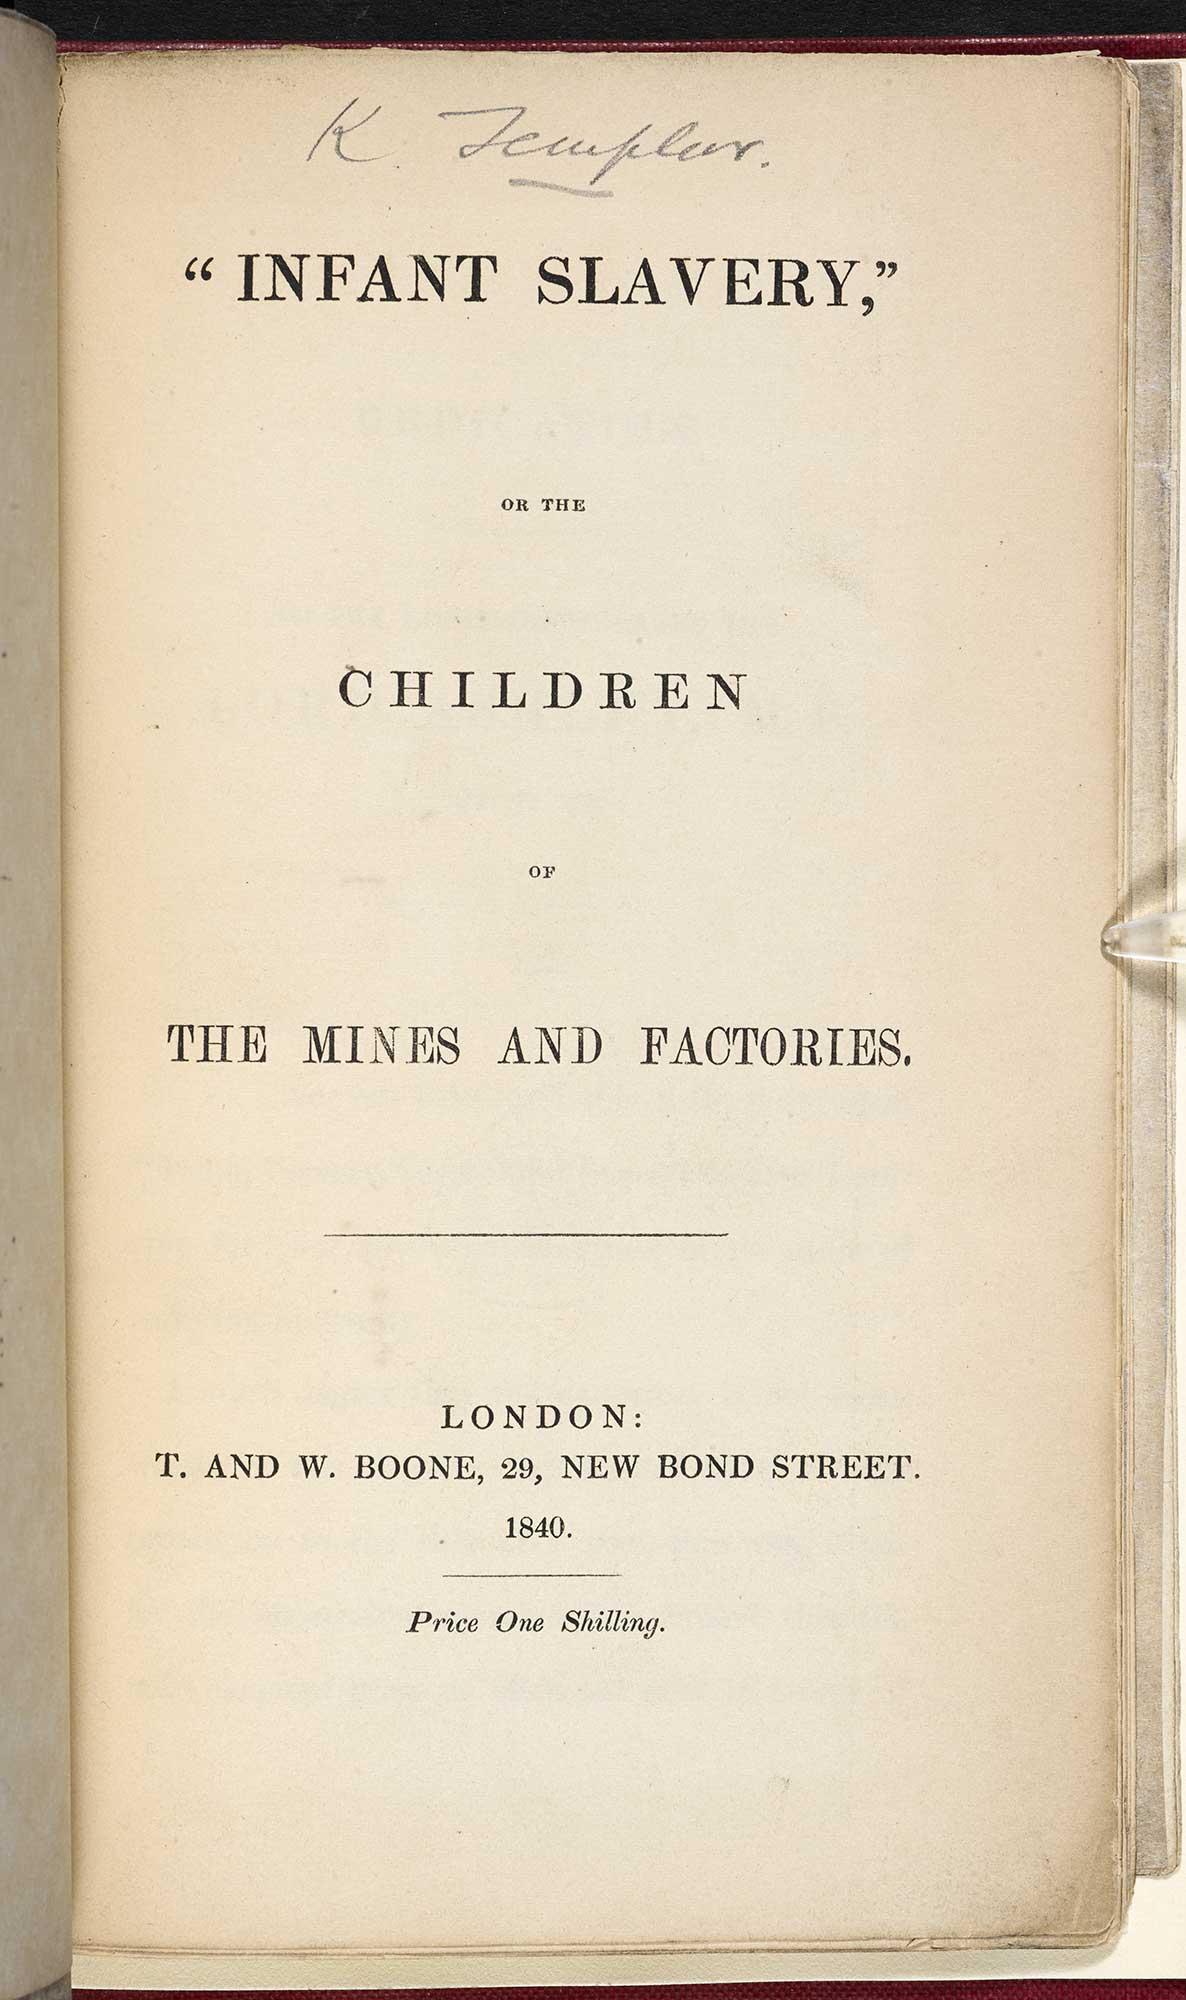 Infant Slavery, a poem